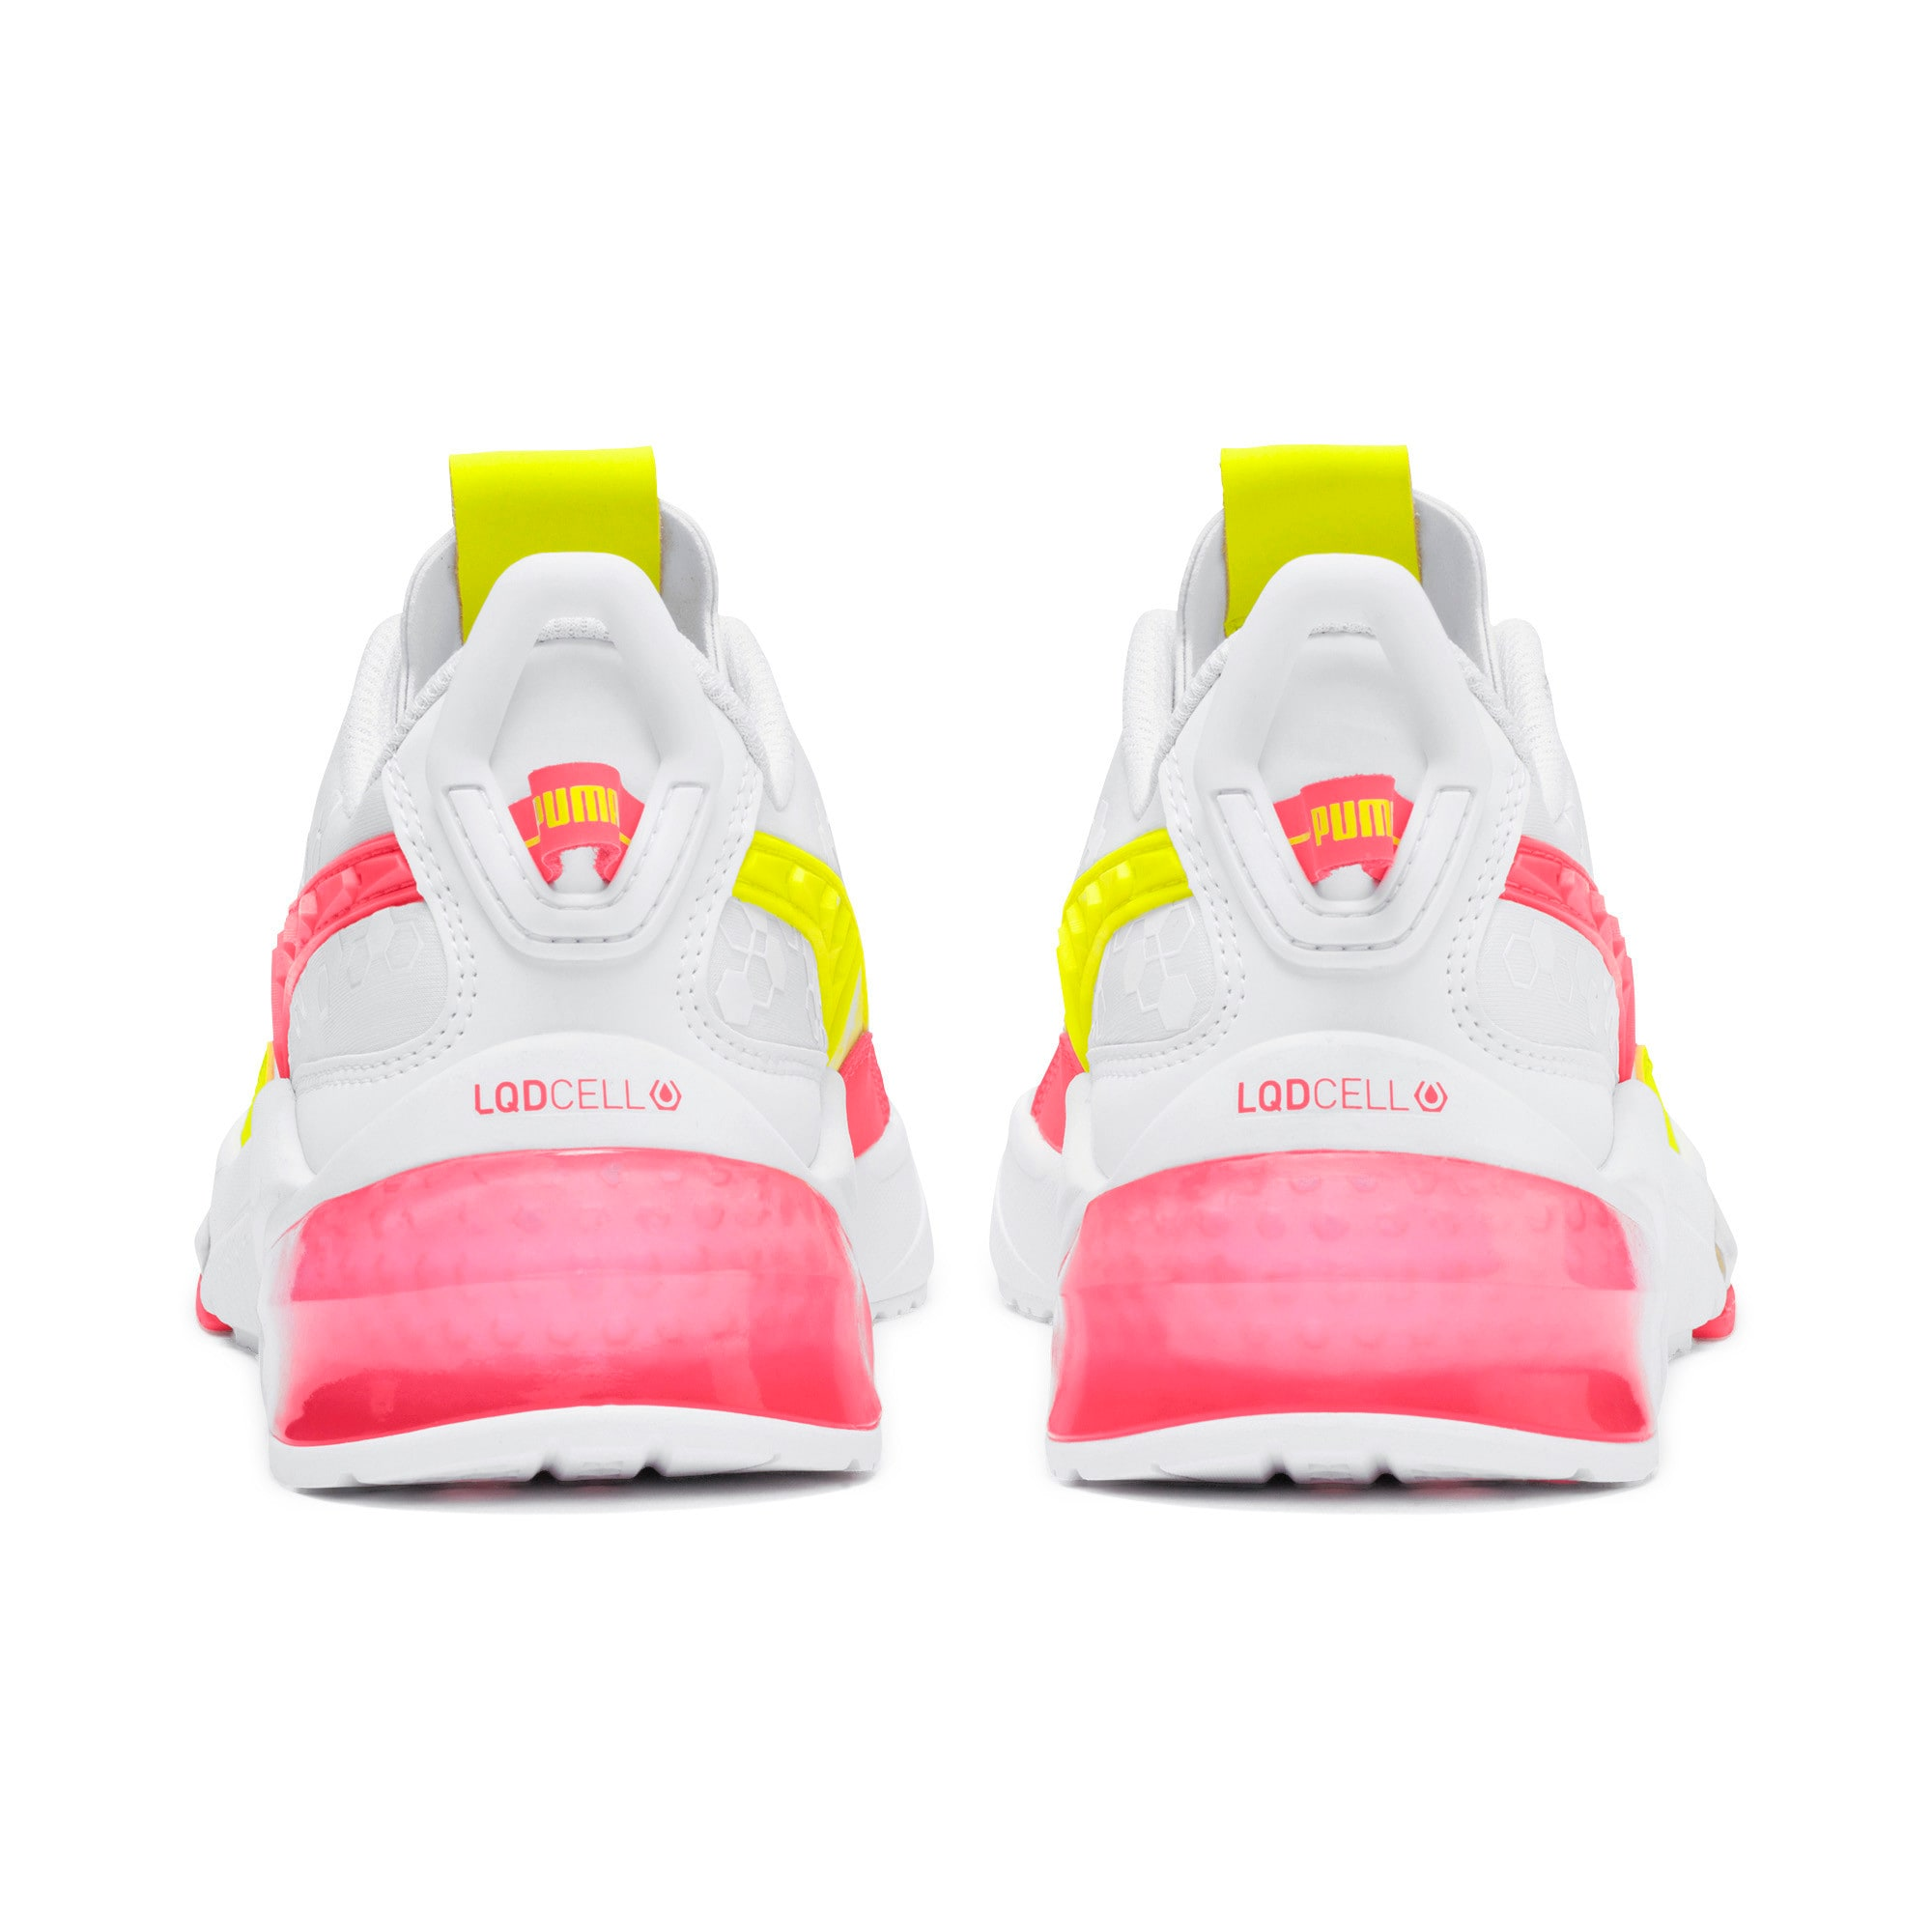 Thumbnail 4 of LQDCELL Optic Training Shoes, Puma White-Y Alert-Pin Alert, medium